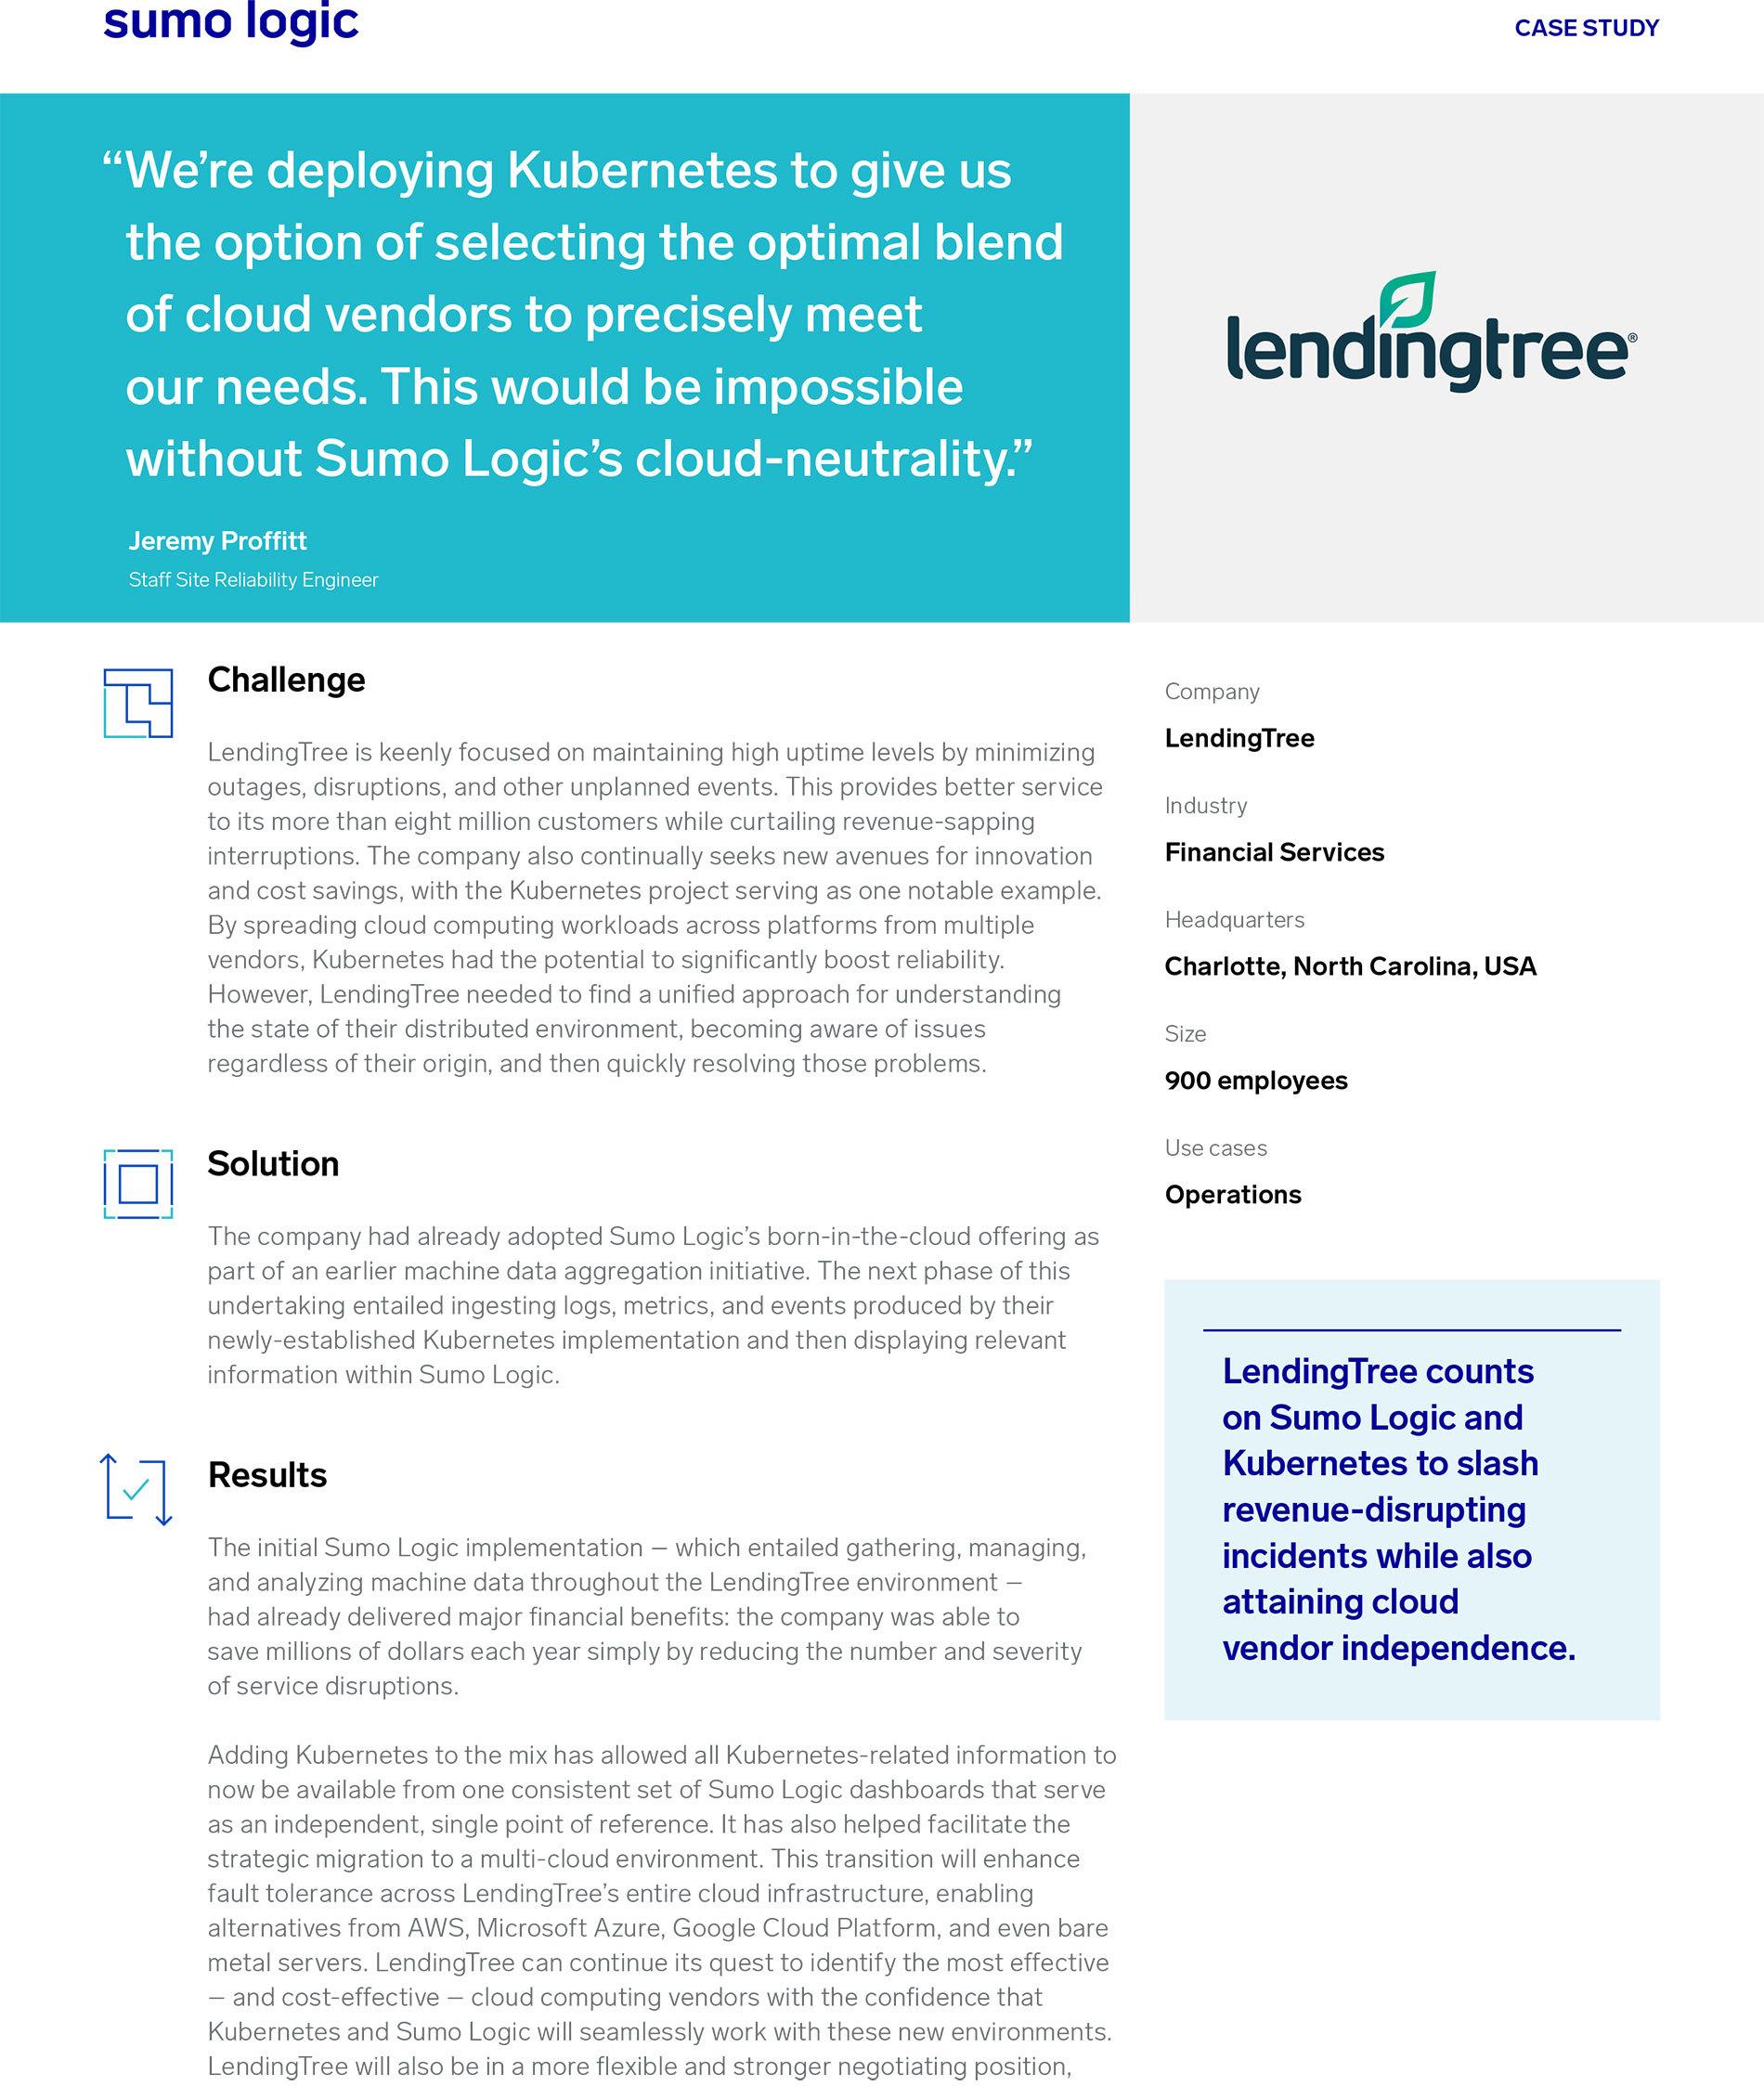 LendingTree Case Study